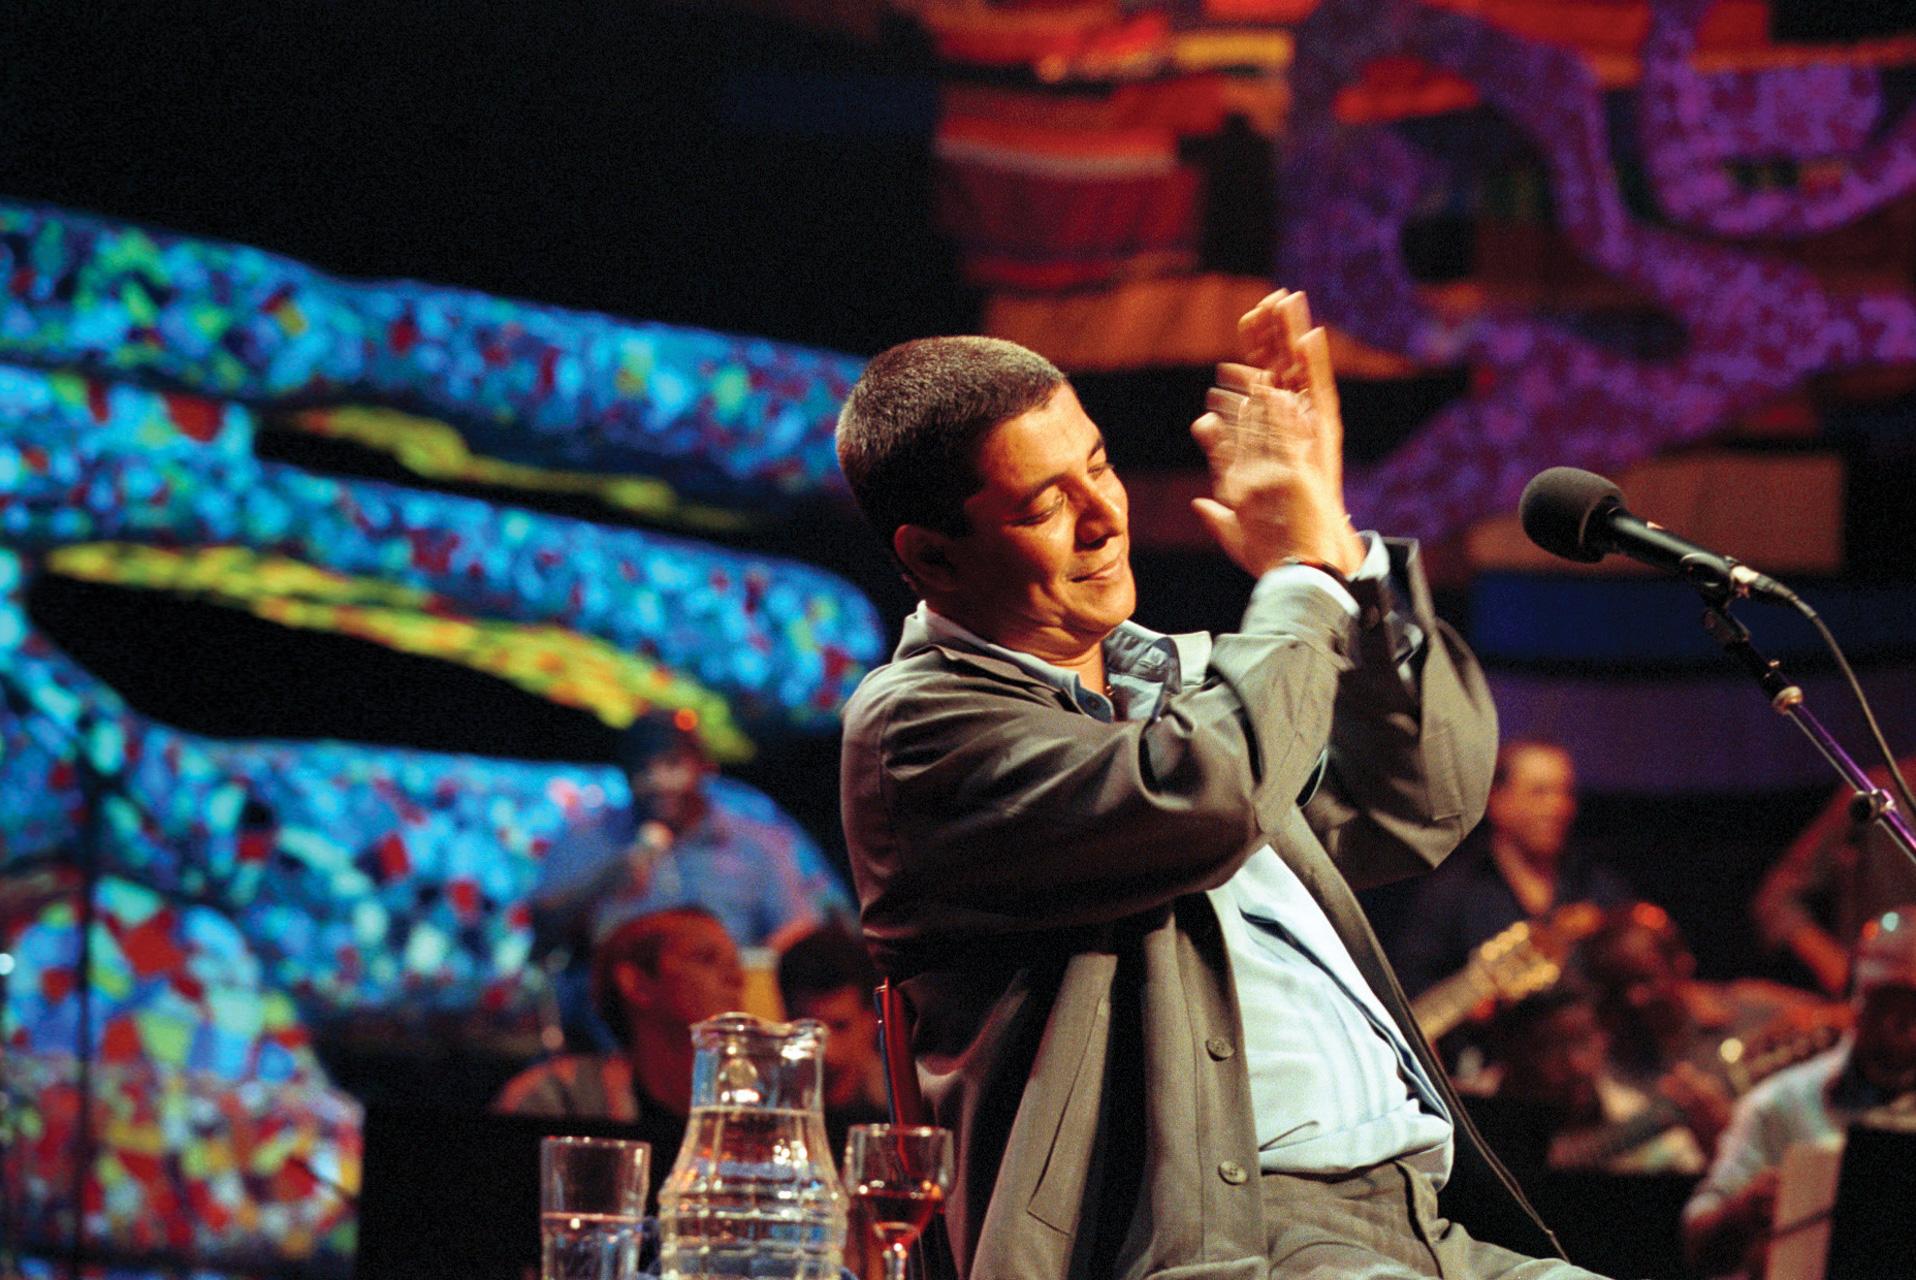 Zeca Pagodinho - Unplugged MTV